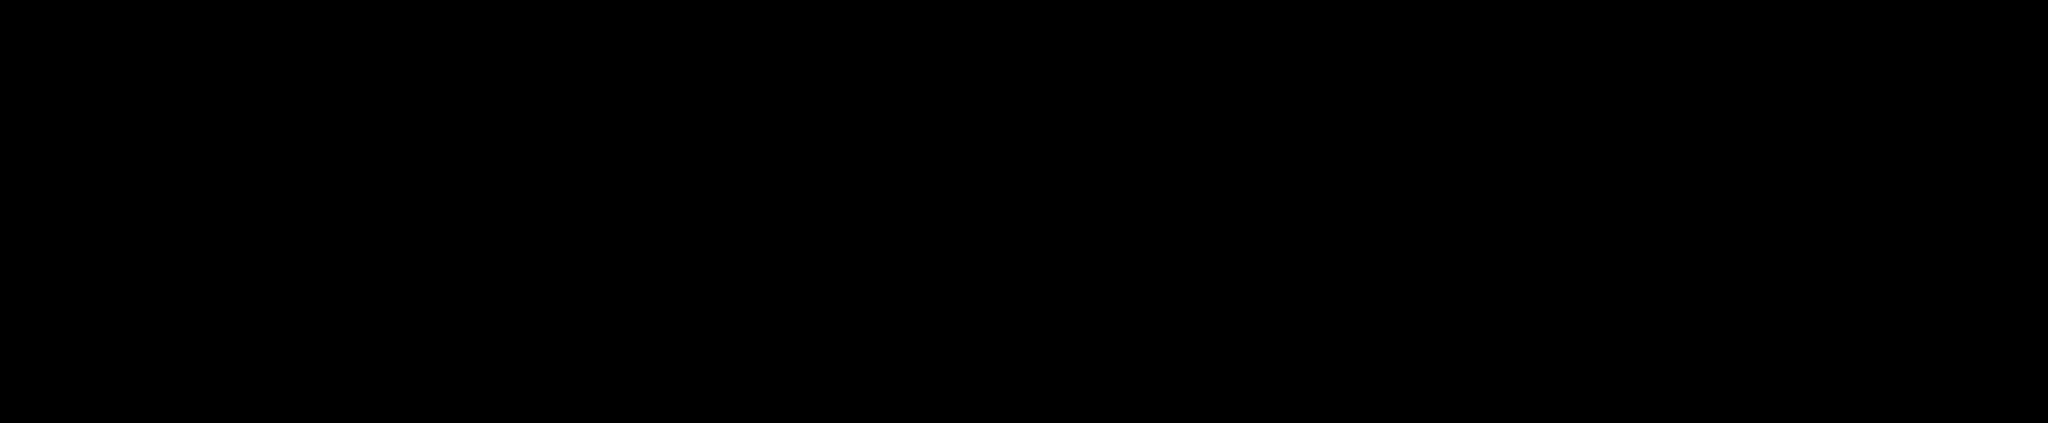 kisspng-laptop-msi-gaming-computer-micro-star-internationa-razer-logo-5b069fc11a7700.7524540815271607691084